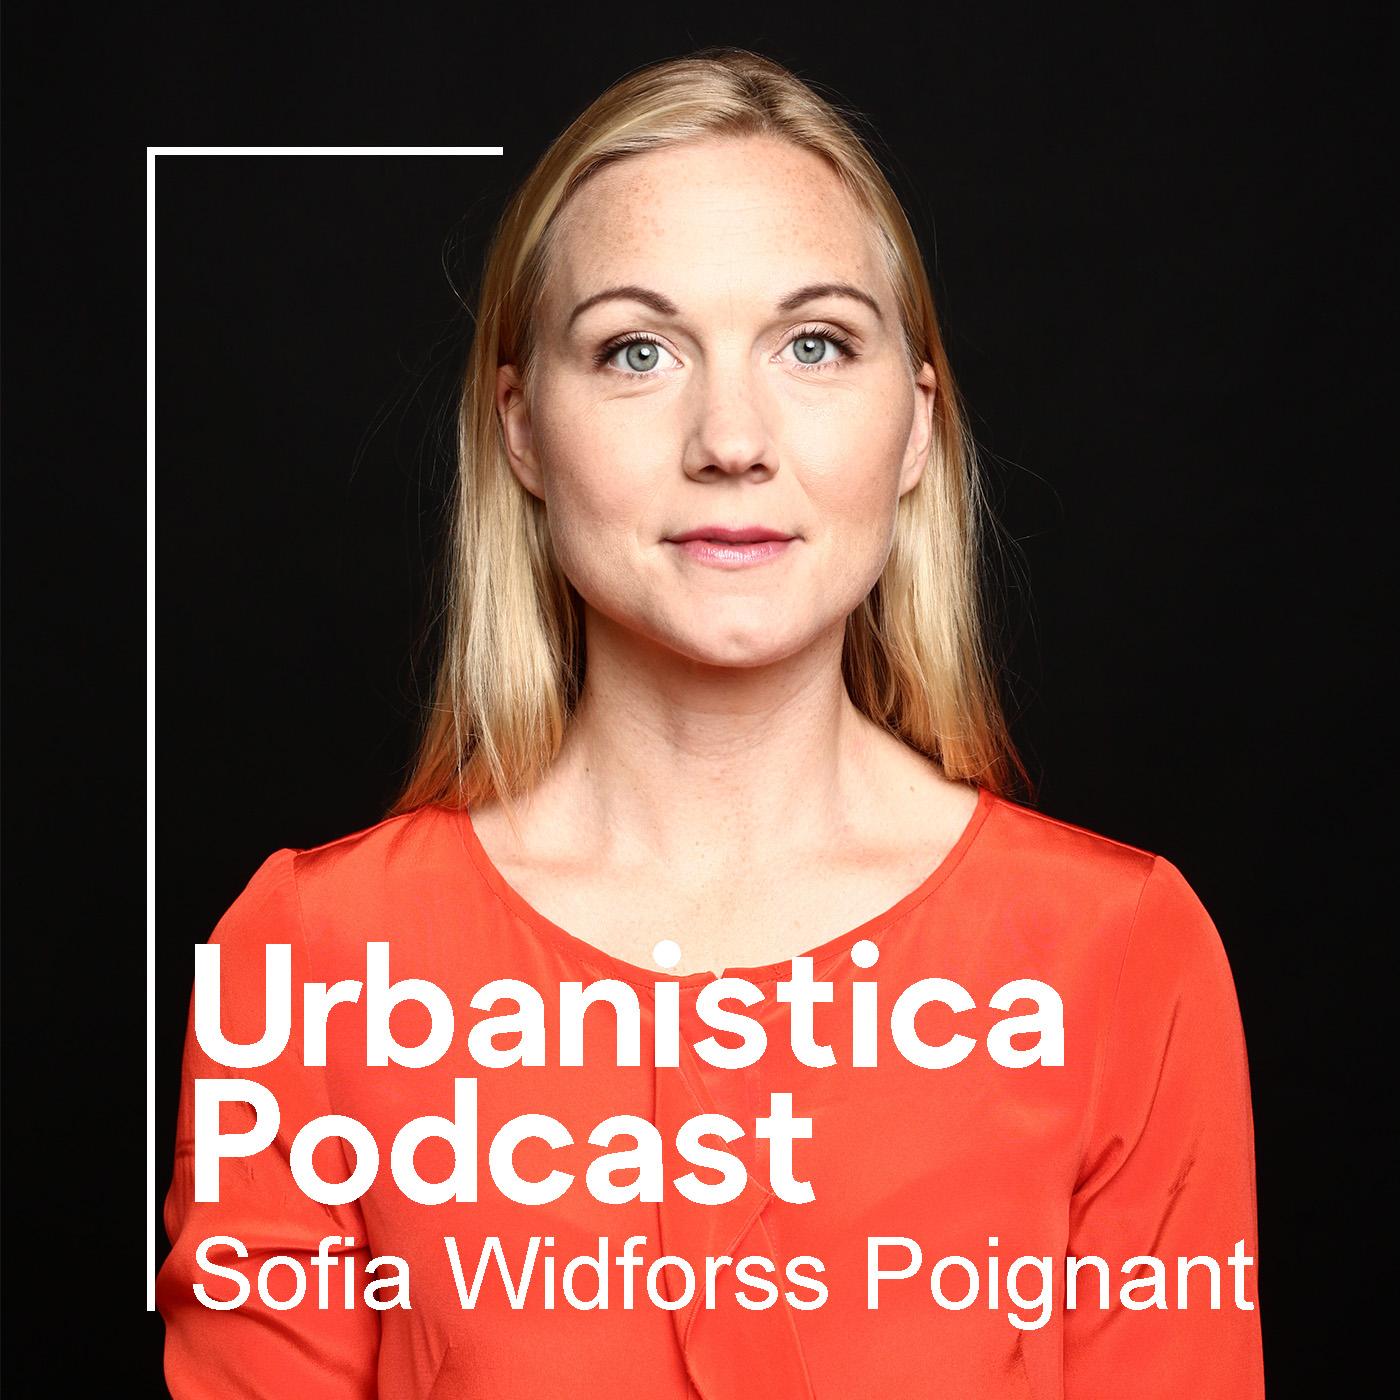 E14. SV. WWF Världsnaturfonden One Planet City Challenge - Sofia Widforss Poignant